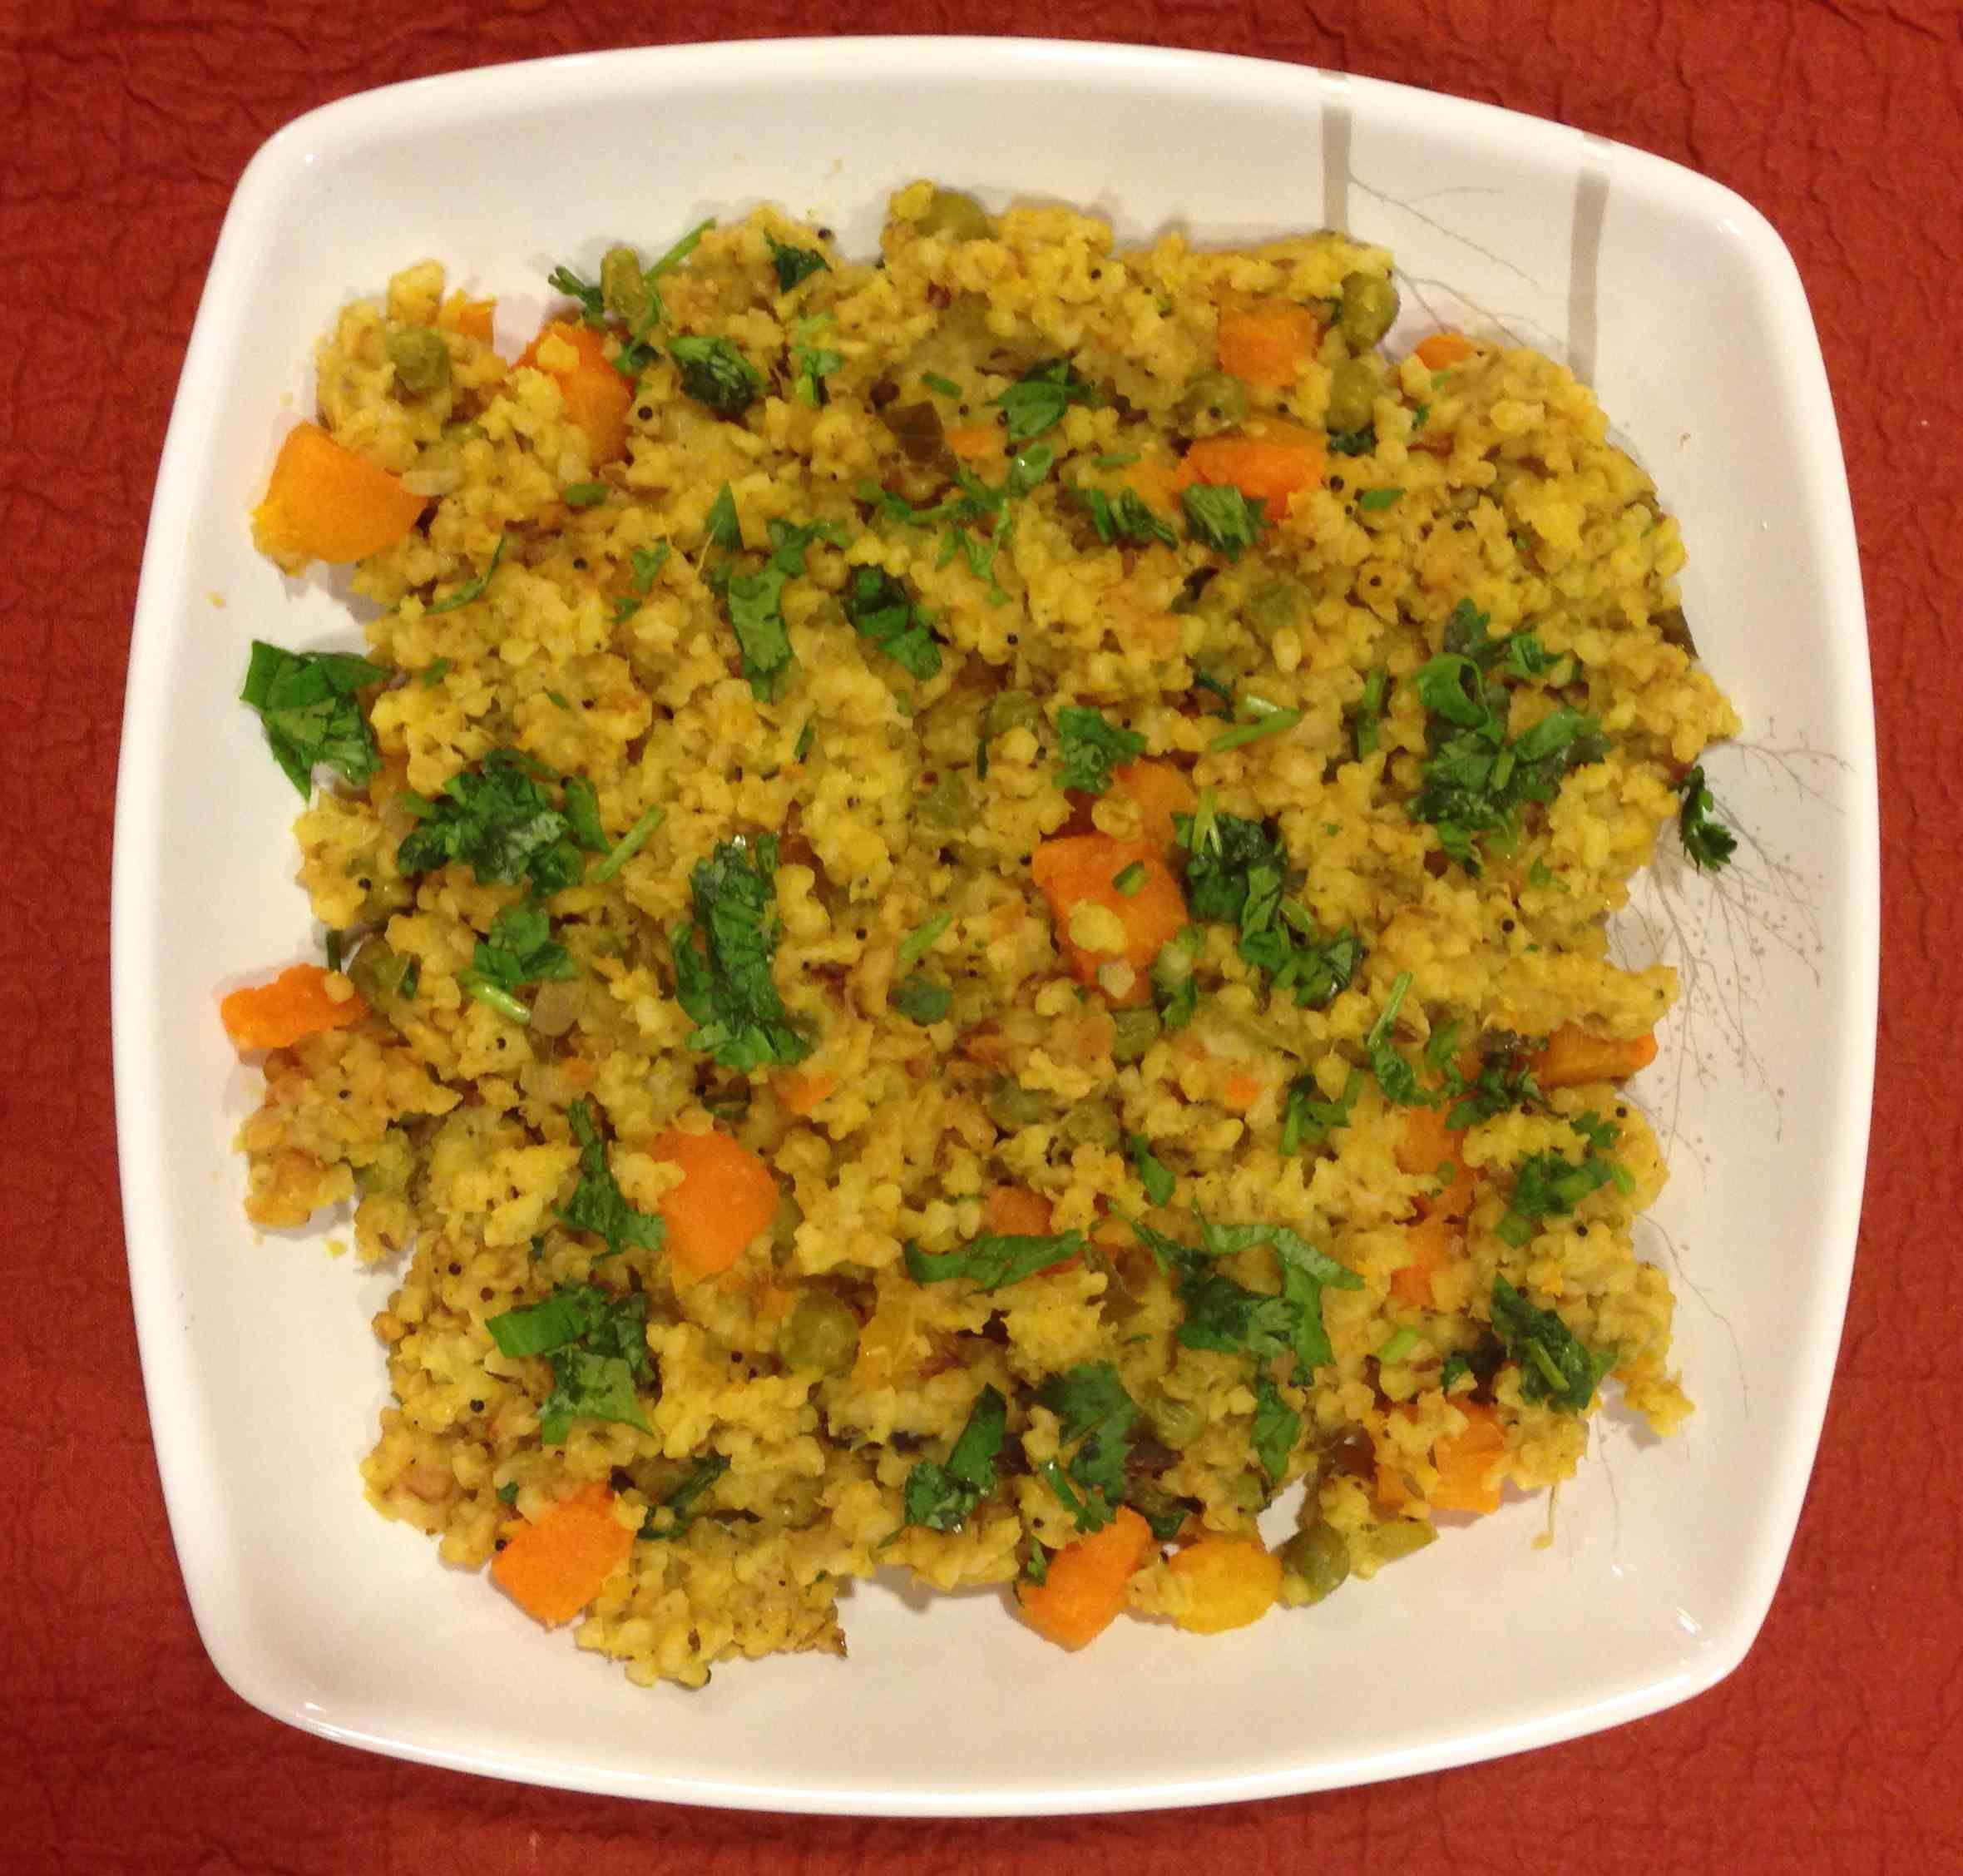 Daliya Khichdi (Cracked Wheat Lentil Khichdi) Khichdi is